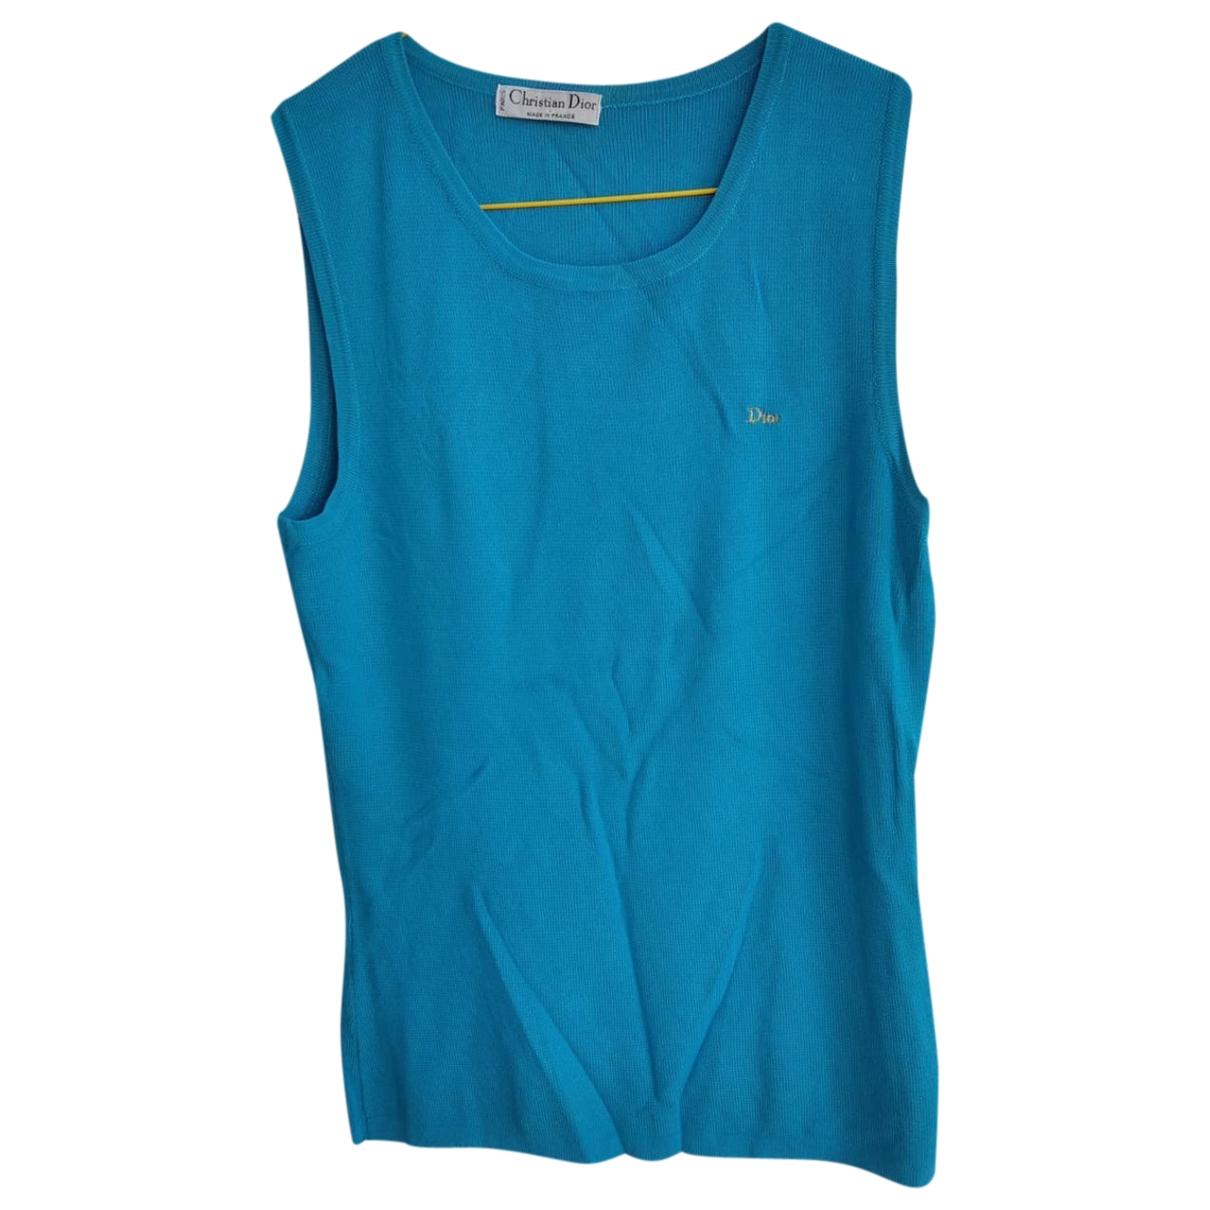 Dior \N Blue  top for Women 38 FR